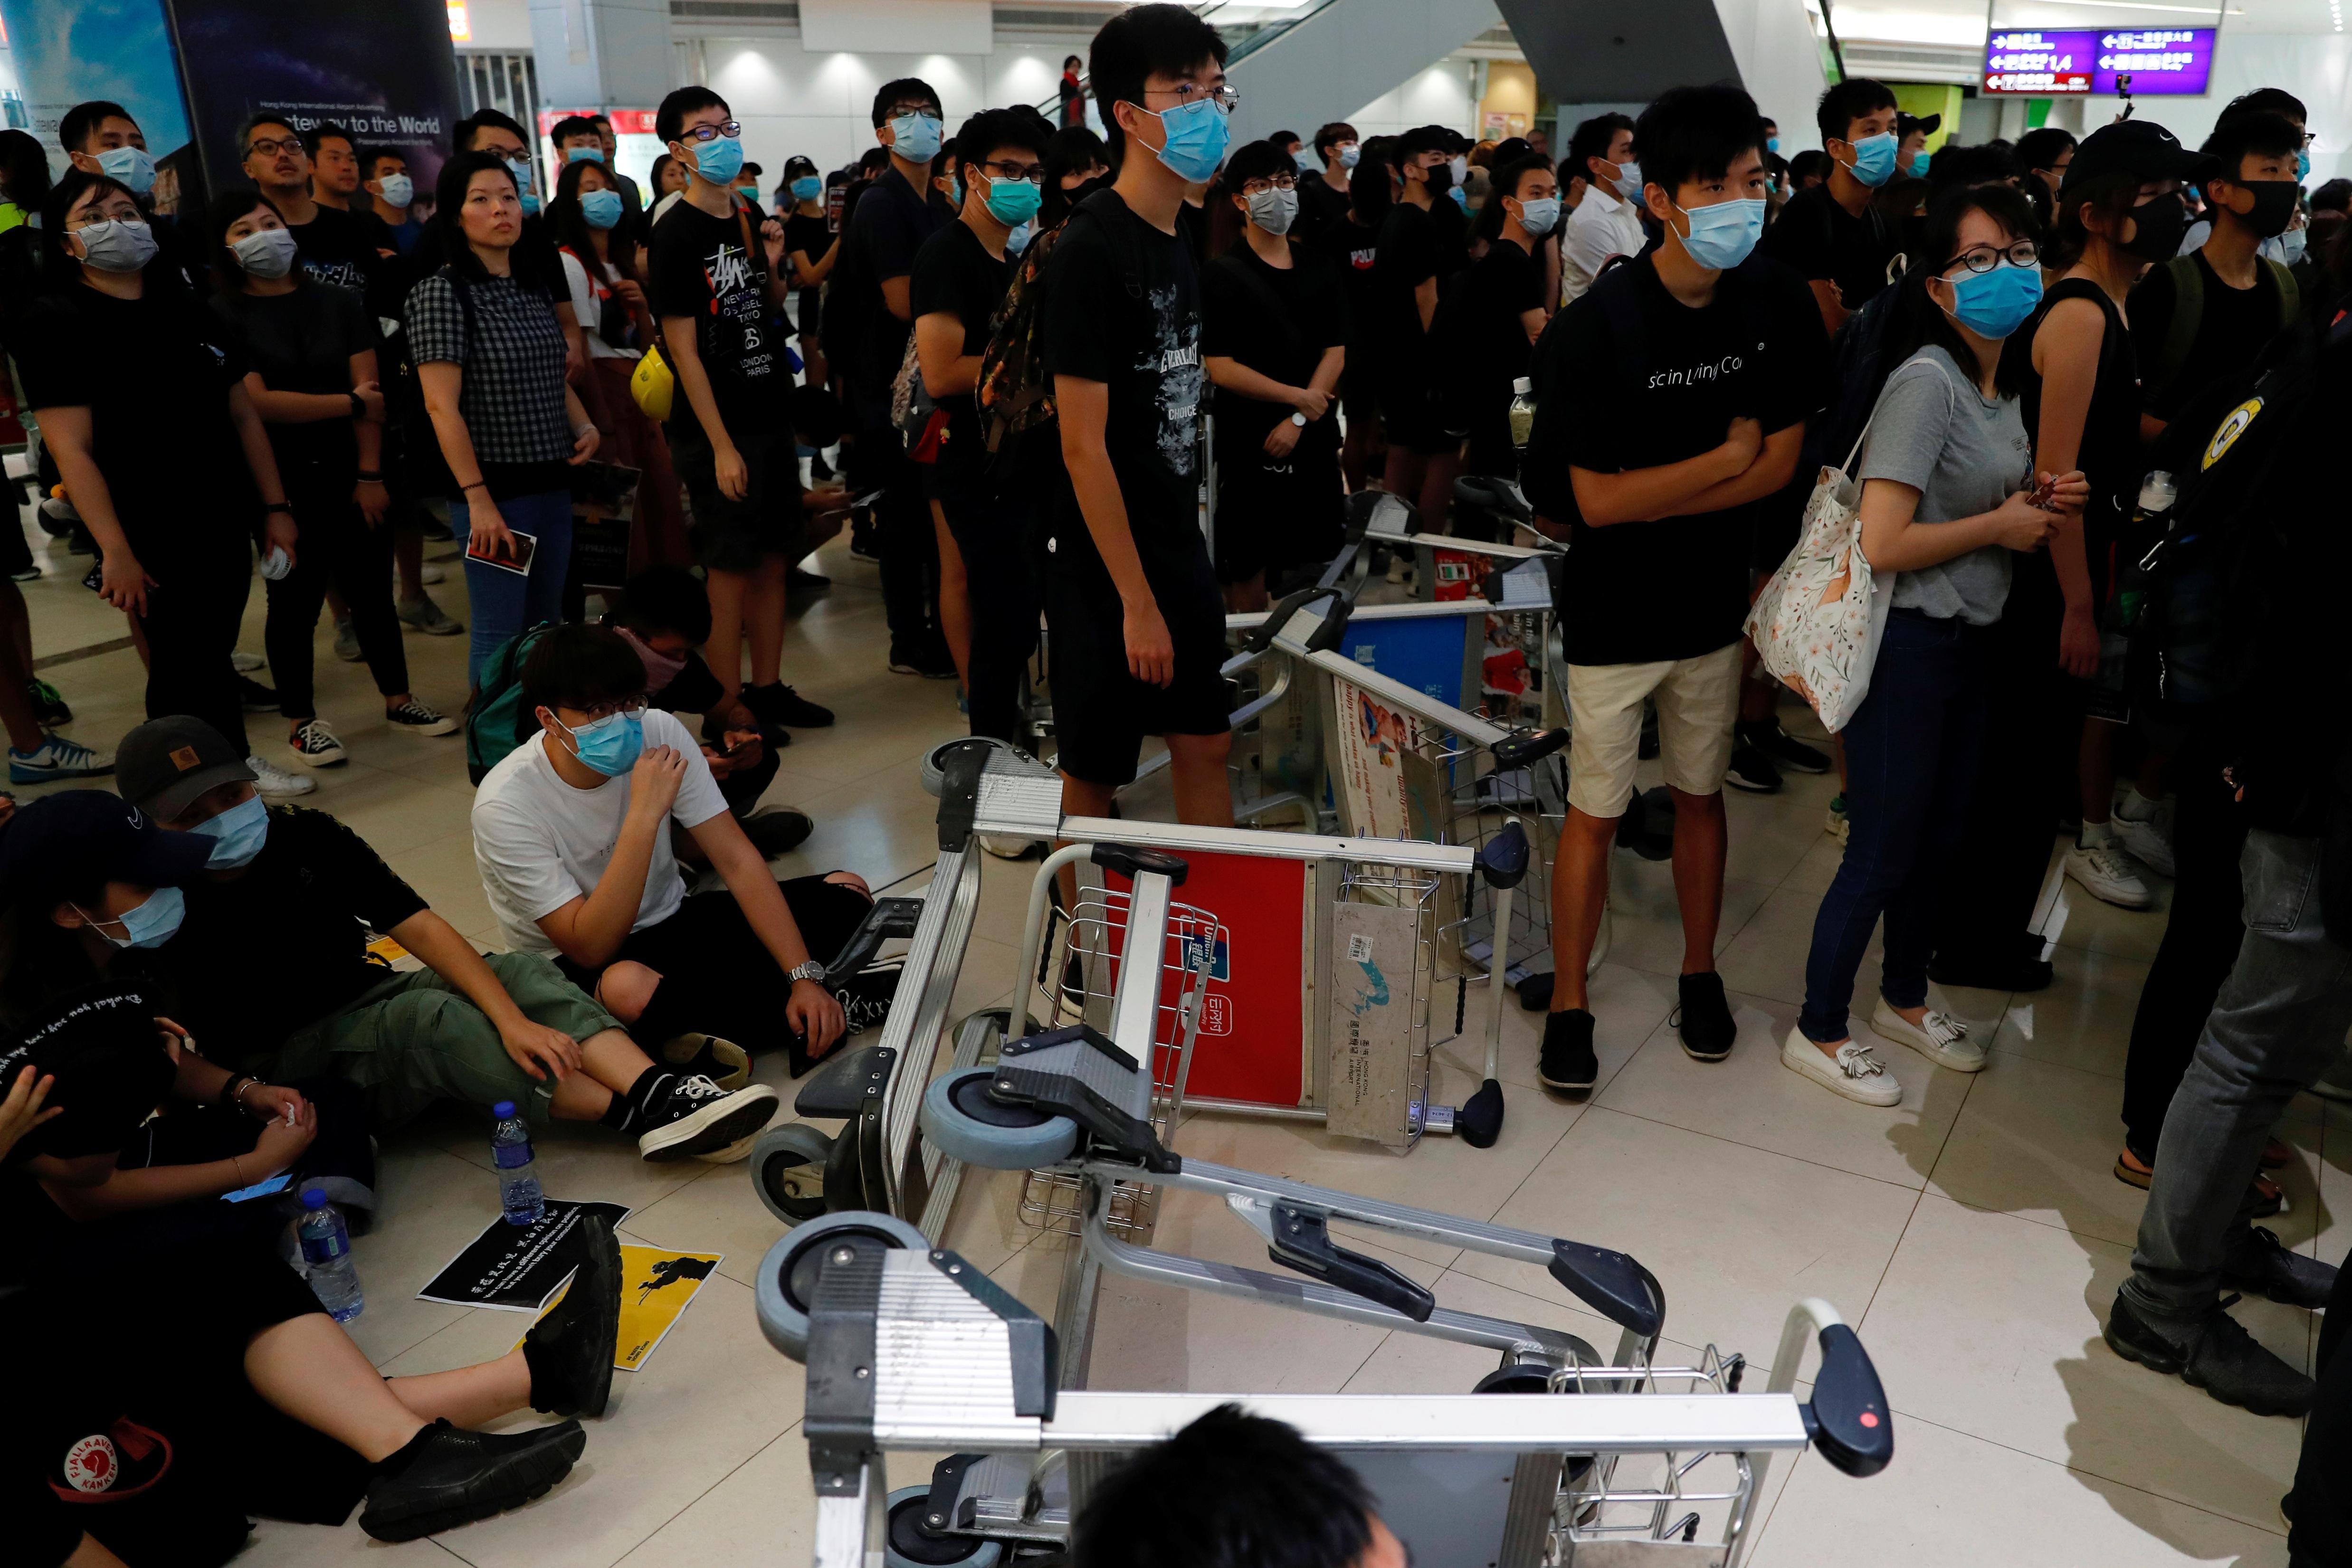 Hong Kong airport halts check-ins as U.N. urges restraint over protests